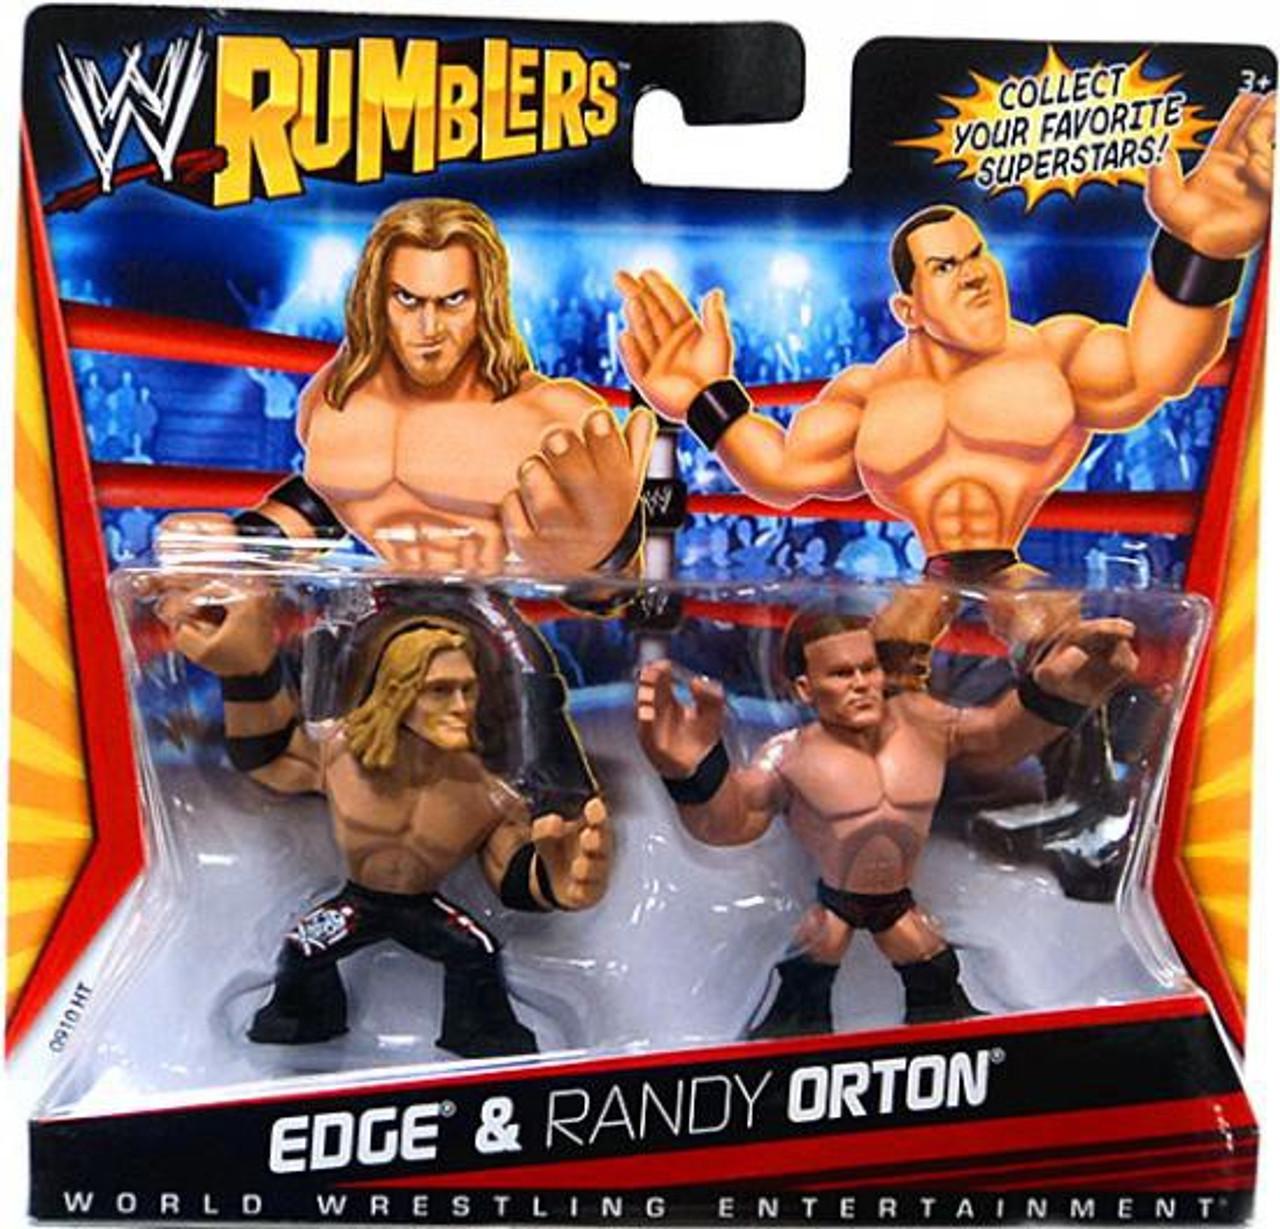 WWE Wrestling Rumblers Series 1 Edge & Randy Orton Mini Figure 2-Pack